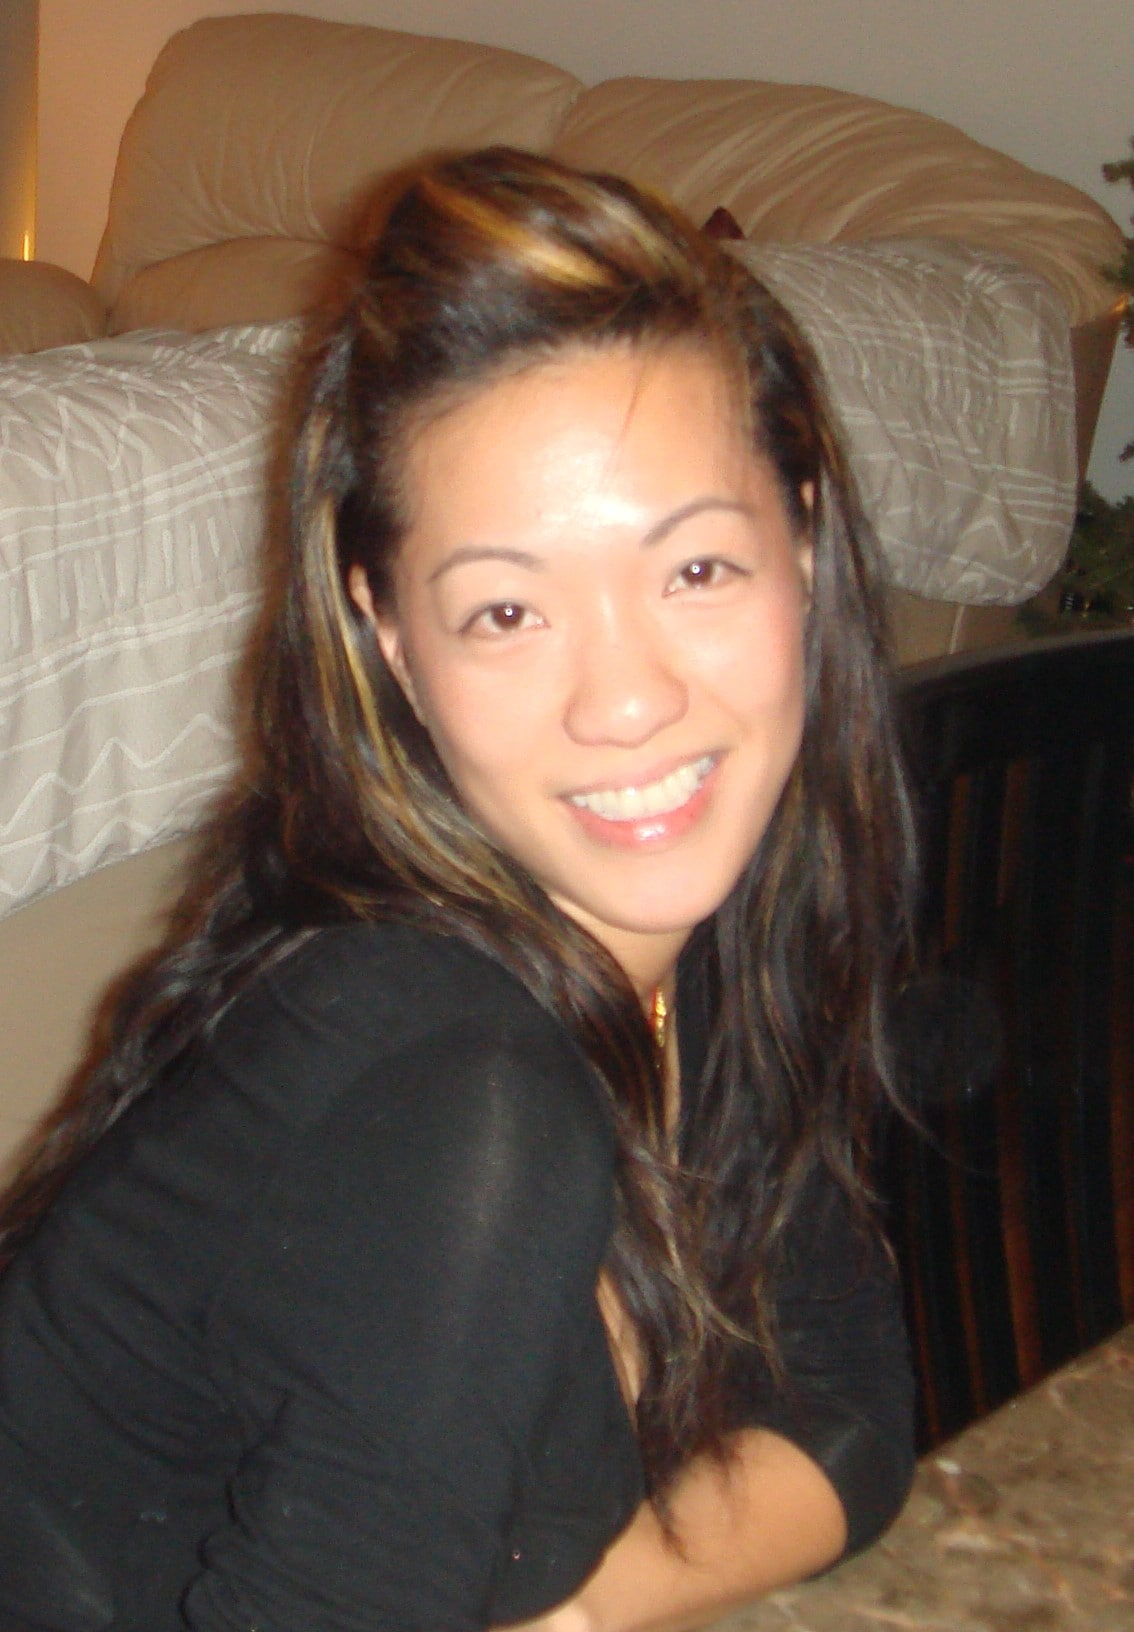 Vanessa from New York